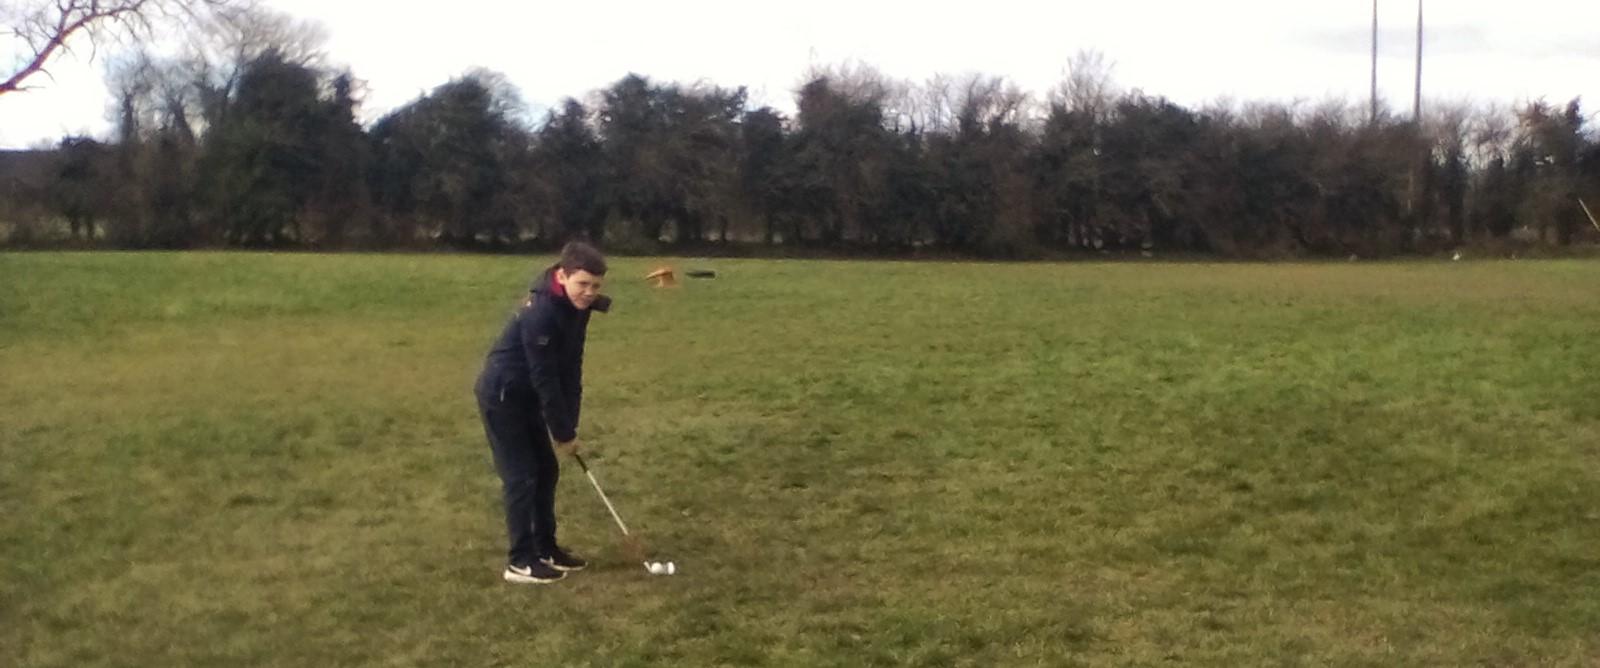 leigh golf